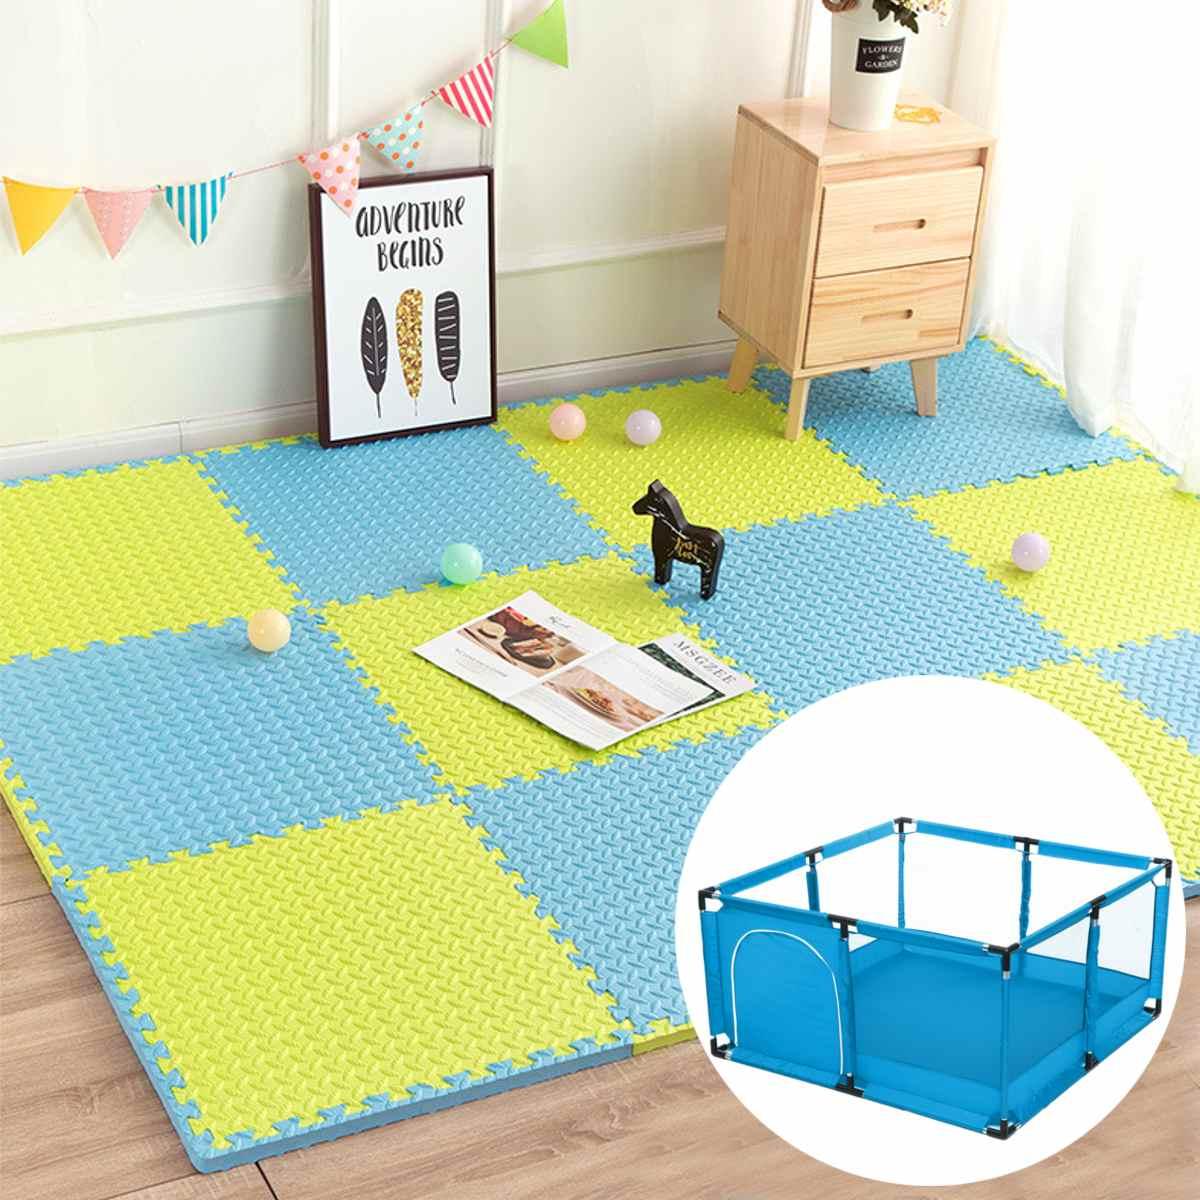 16Pcs 30x30x1.2cm Interlocking Puzzle Mat Soft EVA Foam Tiles Leaf-Pattern New Kids Play Carpet Home Floor For Baby Playpen